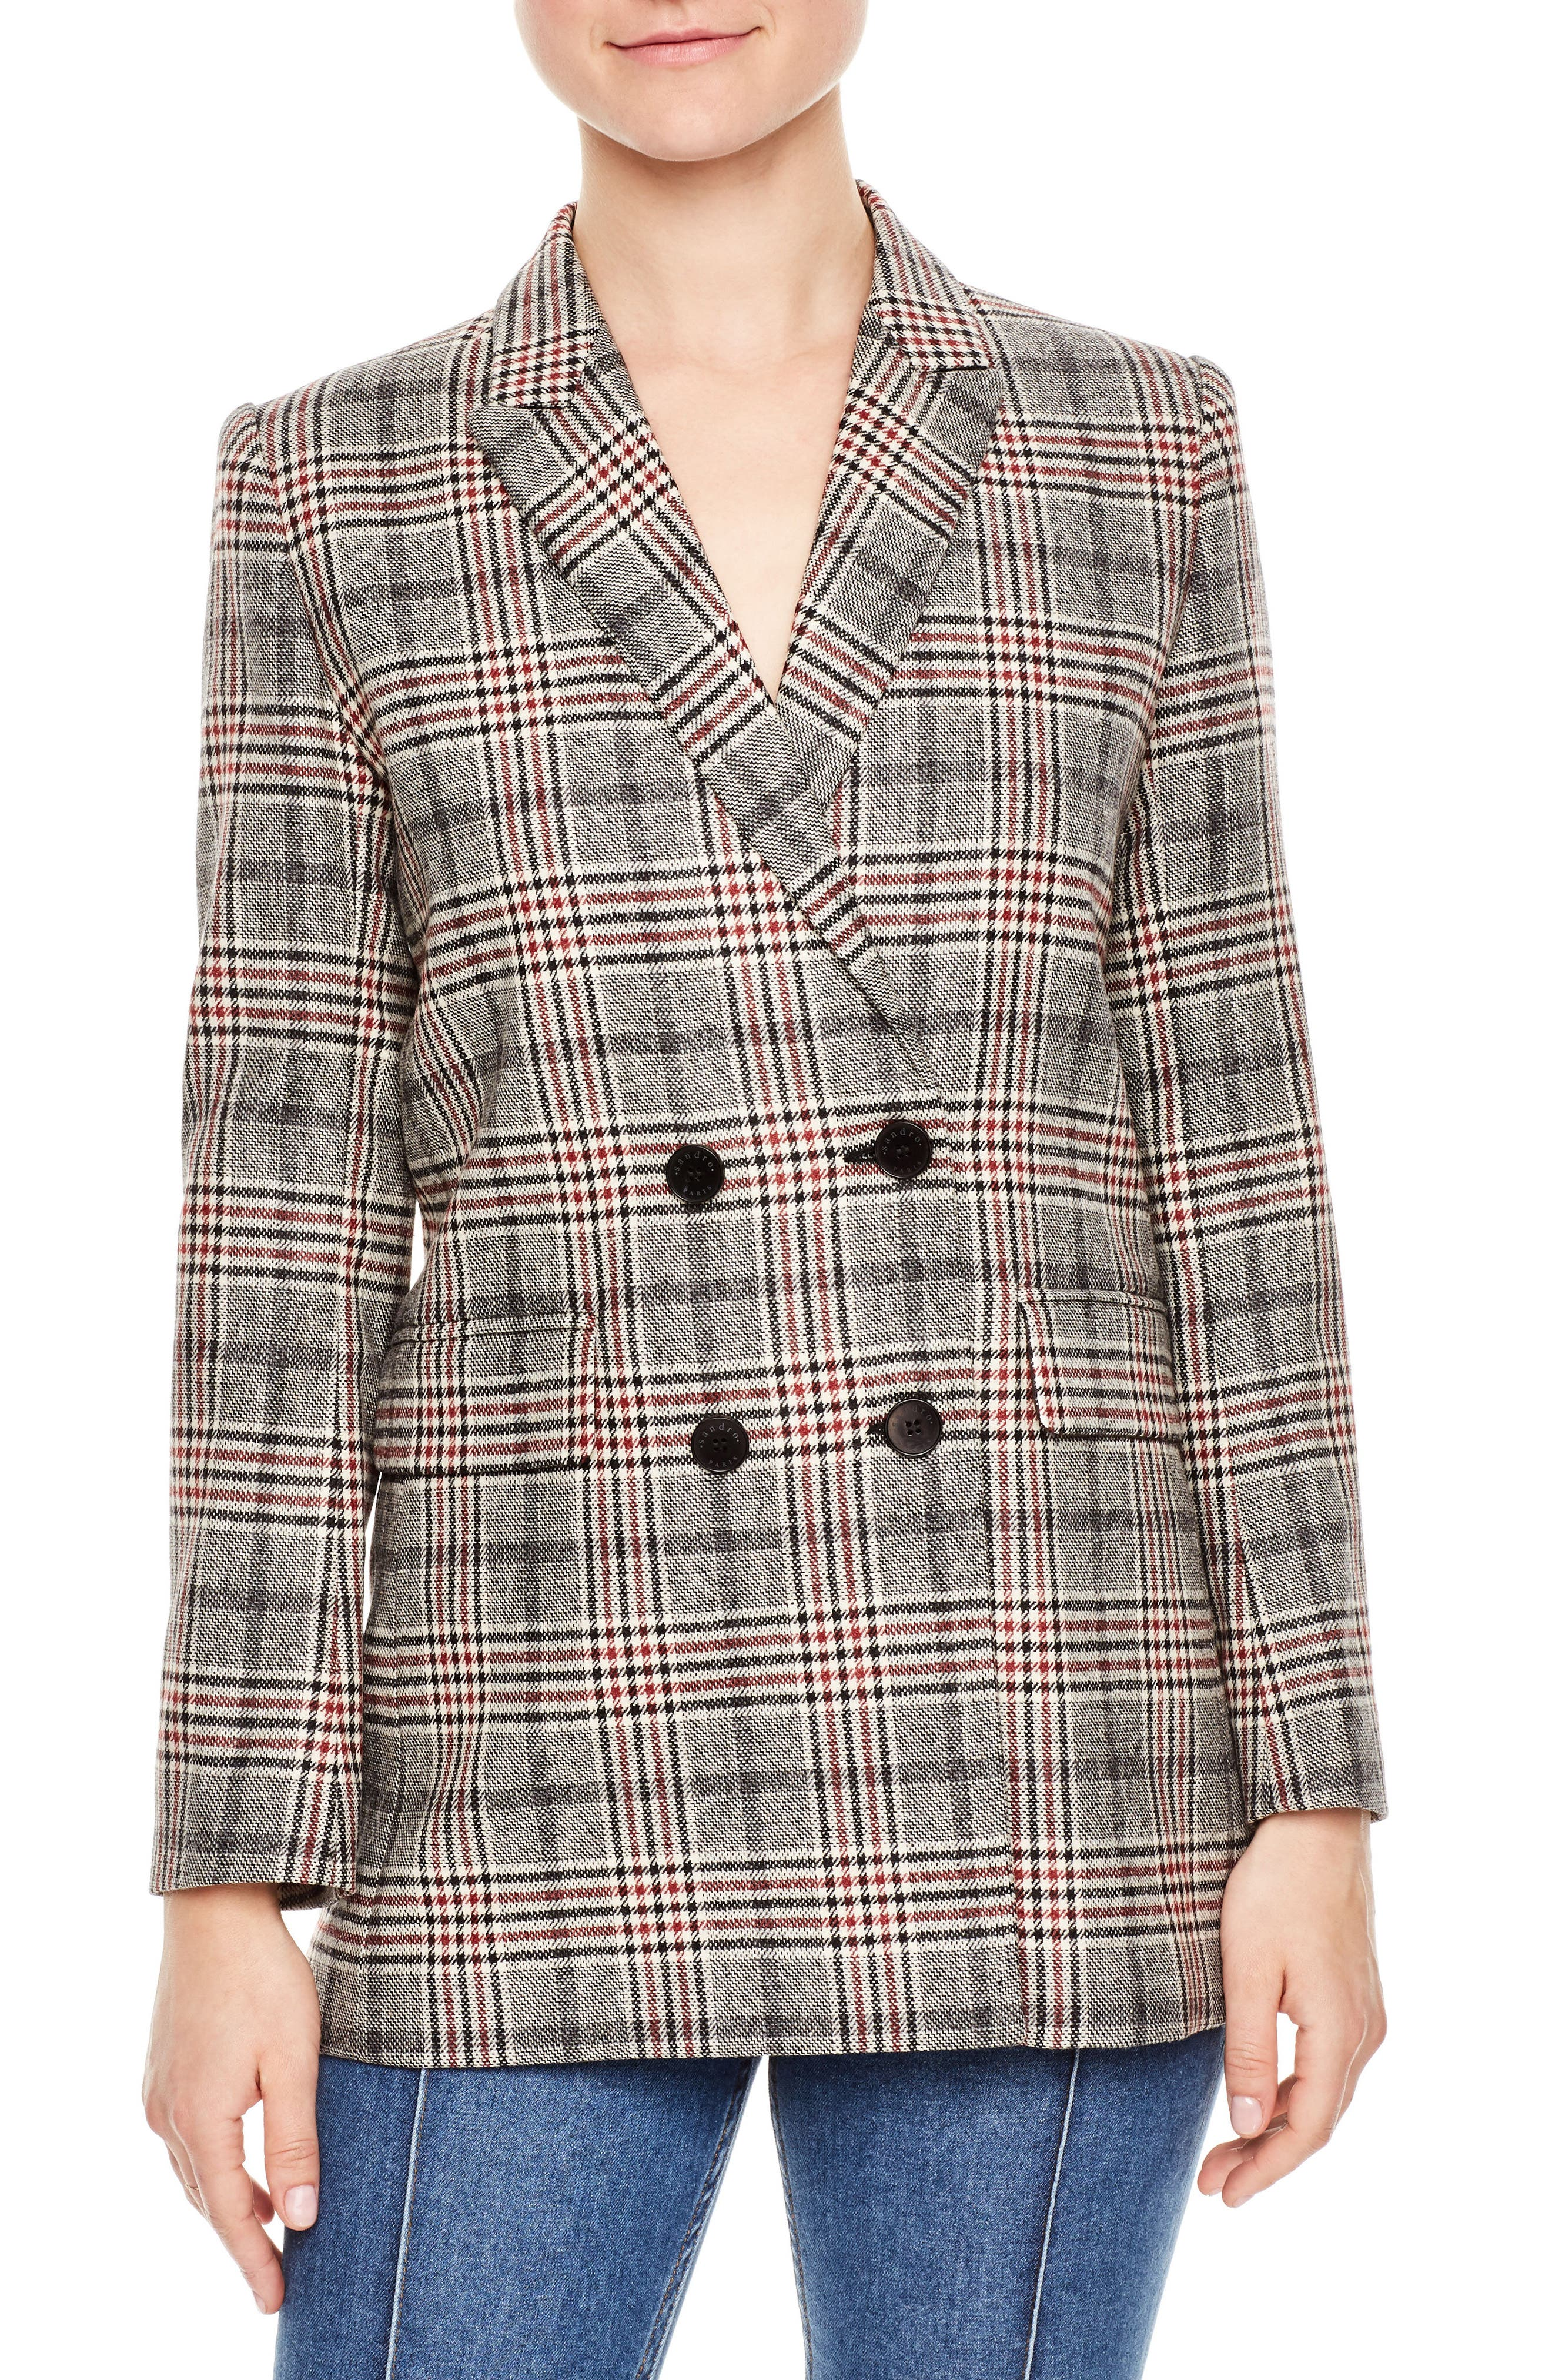 SANDRO Plaid Wool Blend Jacket, Main, color, 020